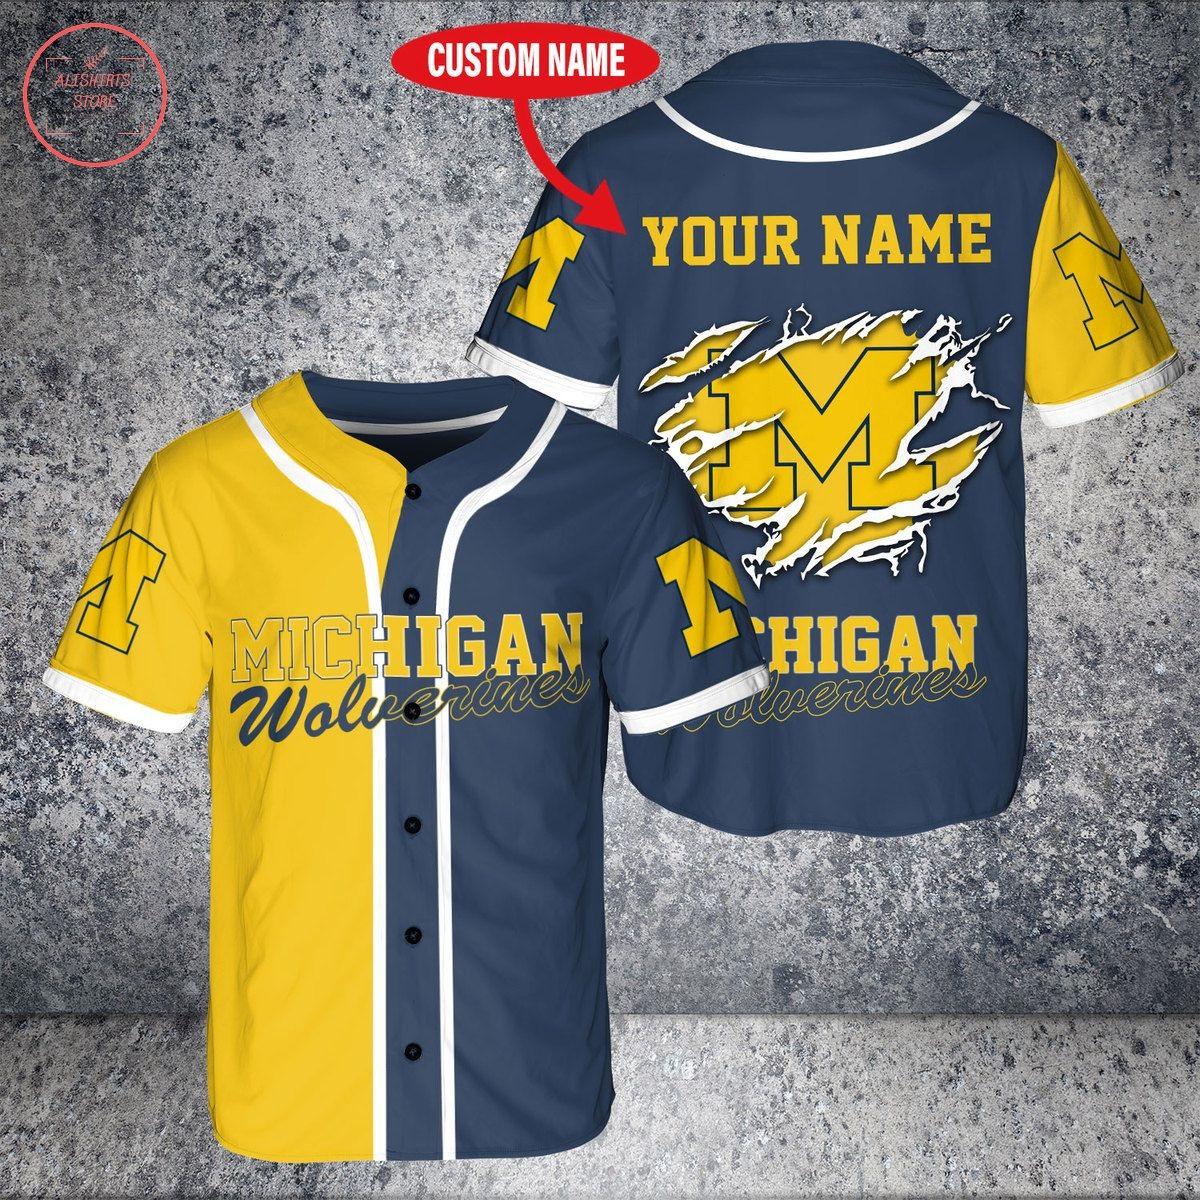 Custom Name NCAA Michigan Wolverines Baseball Jersey